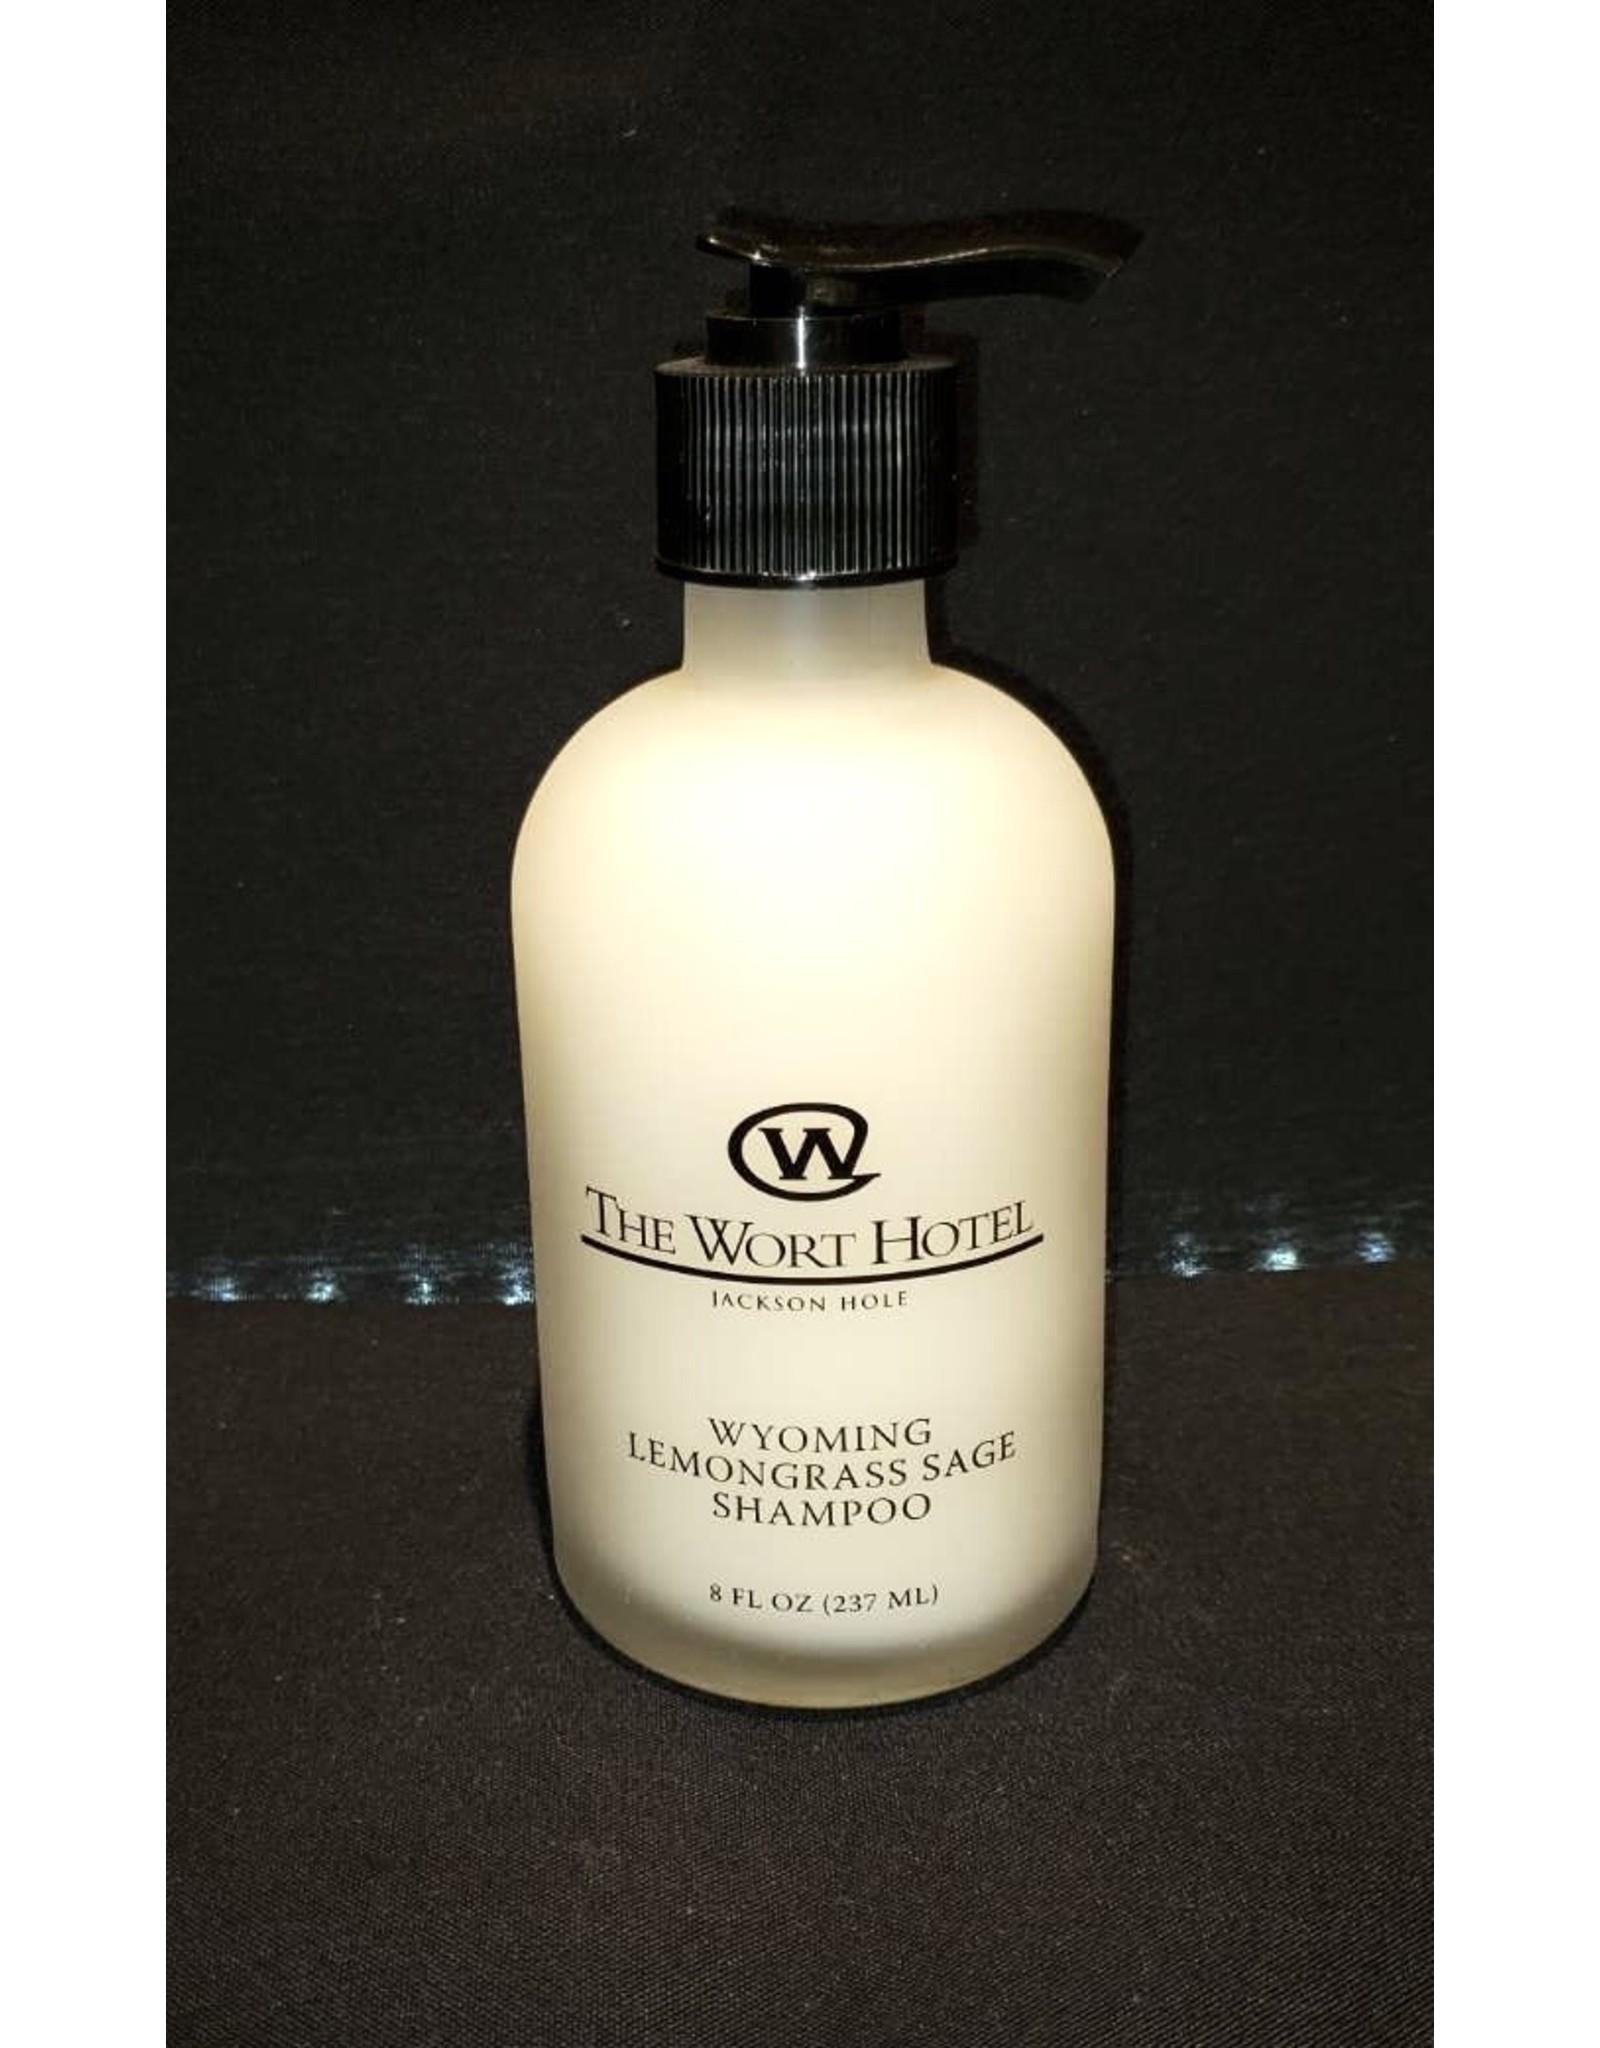 The Wort Hotel Shampoo